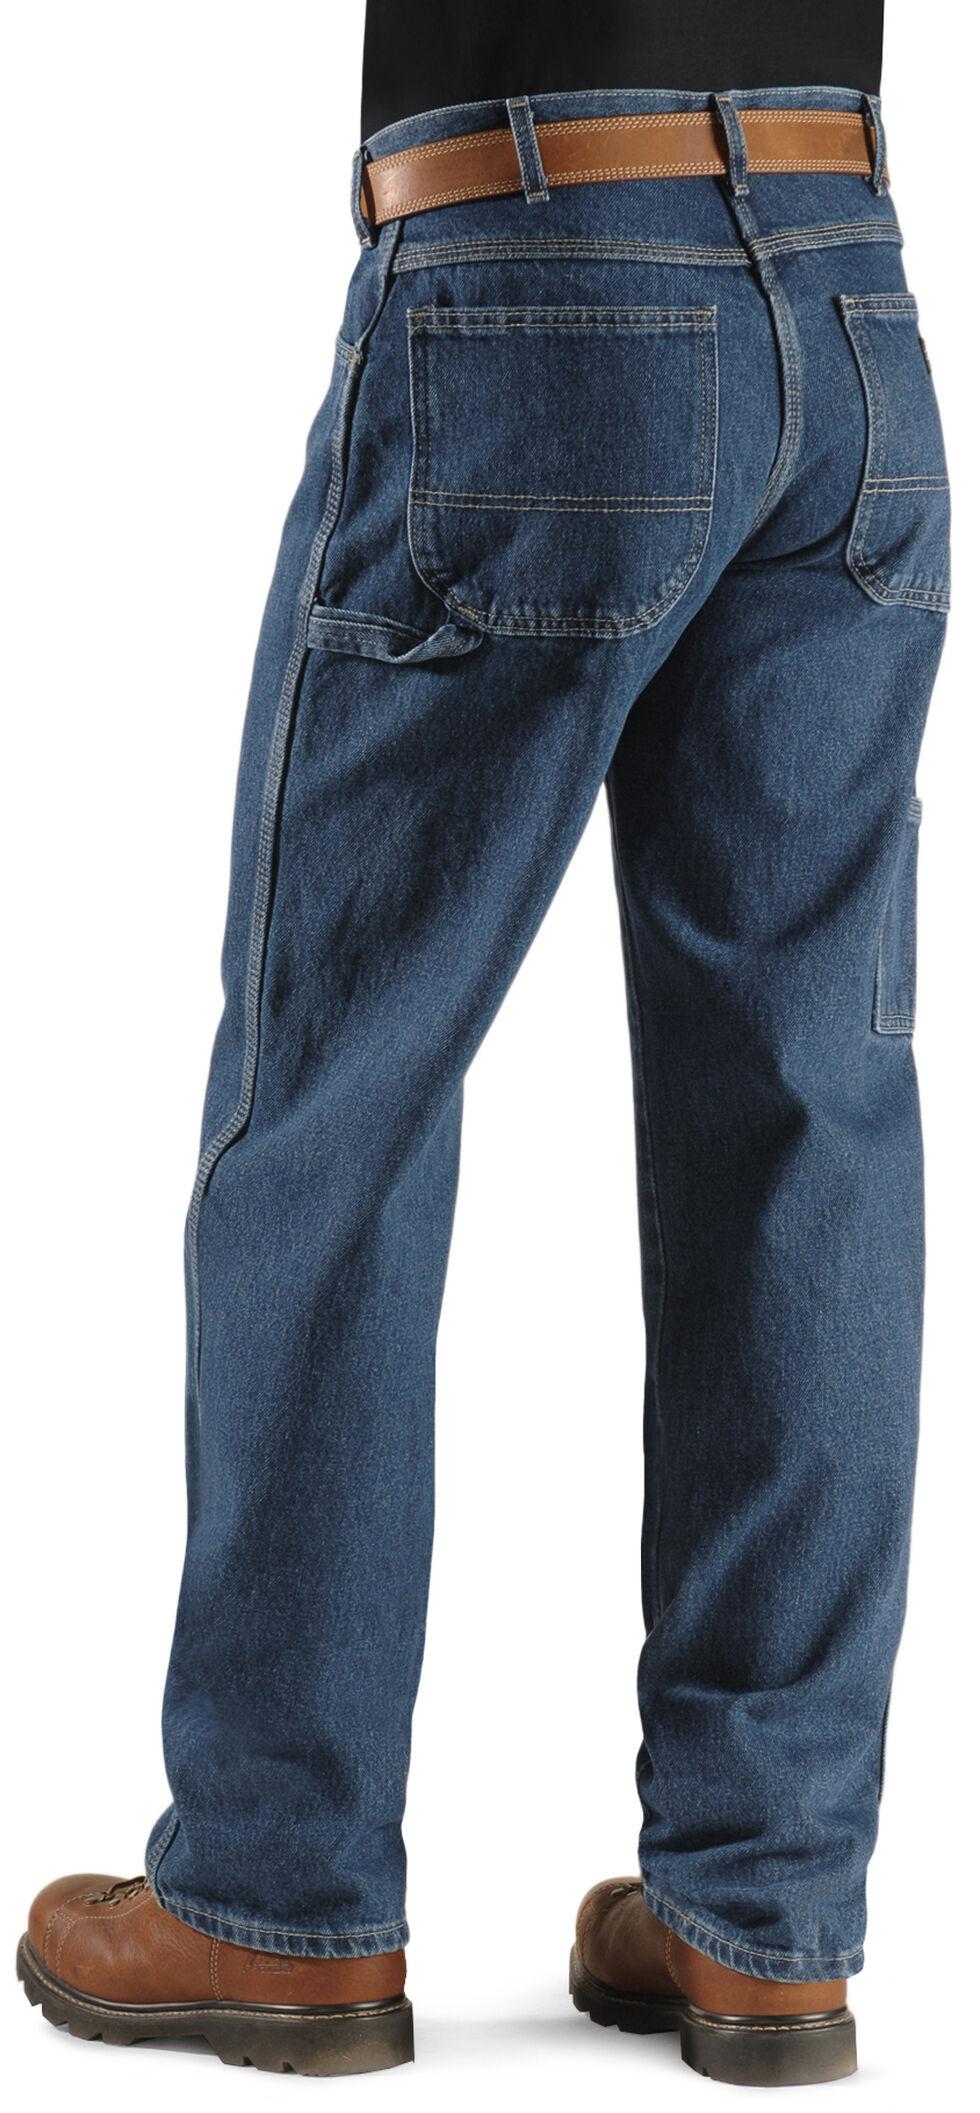 Dickies Relaxed Carpenter Work Jeans - Big & Tall, Stonewash, hi-res